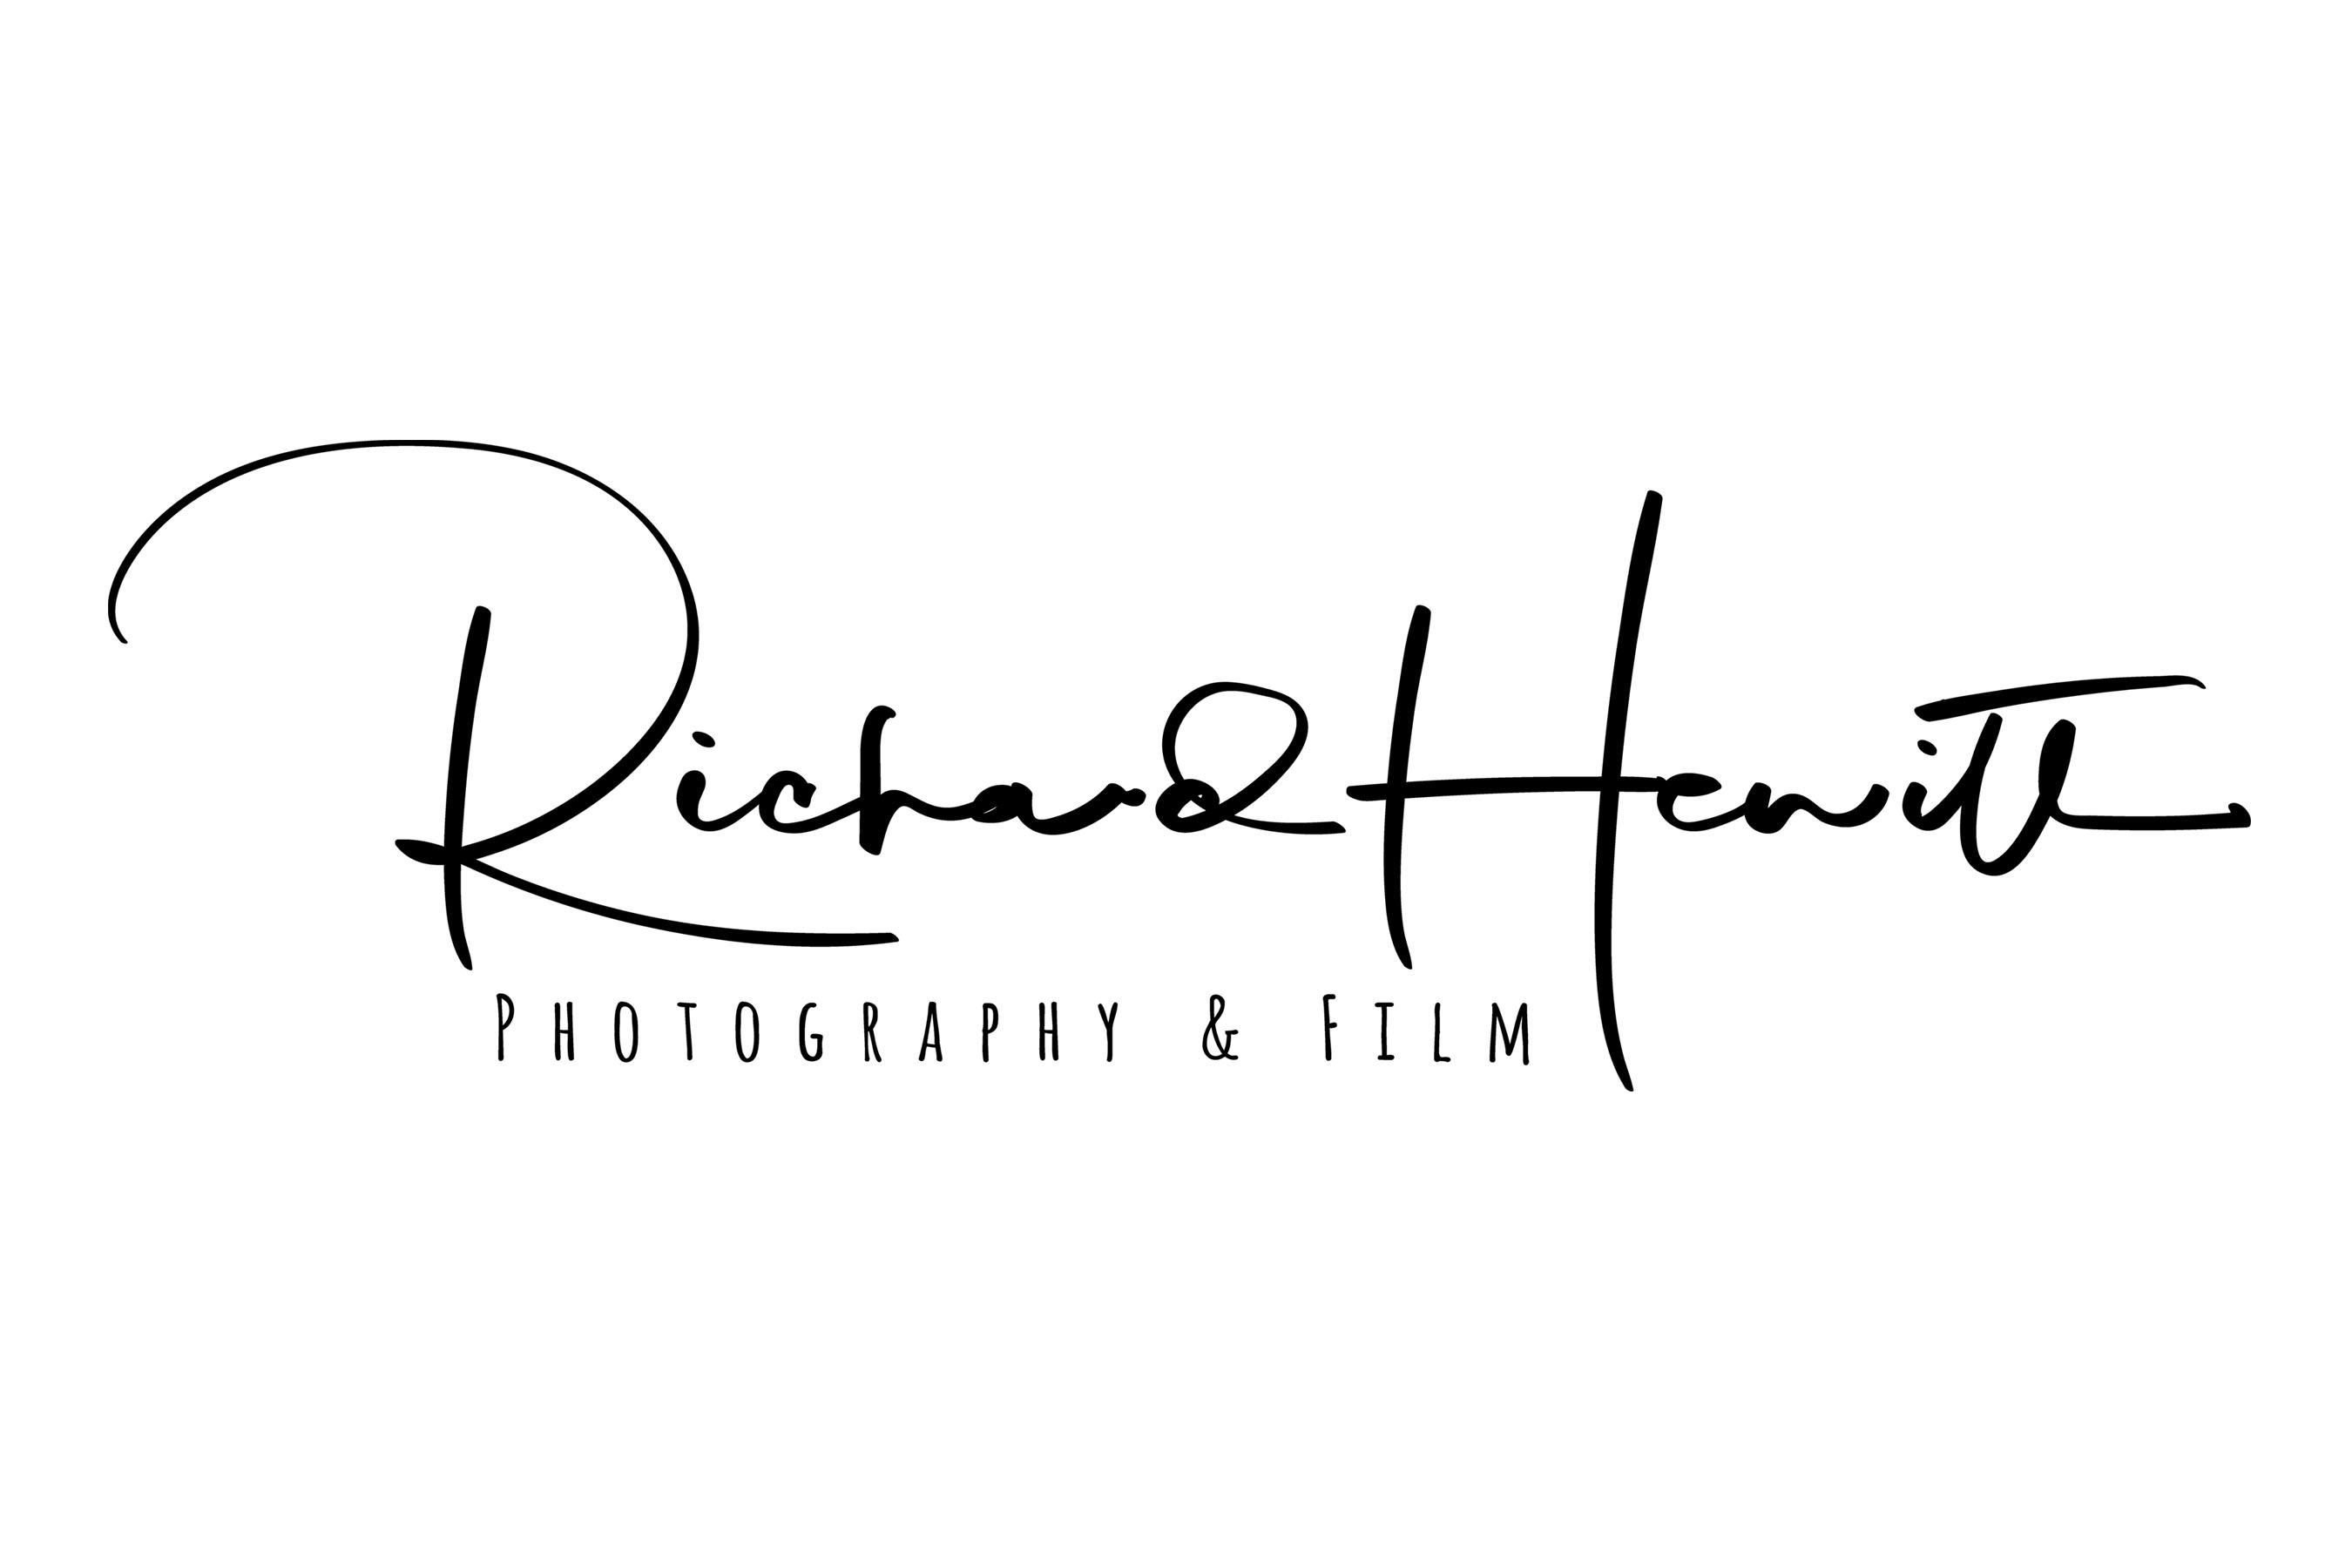 Richard Hewitt Photography & Film